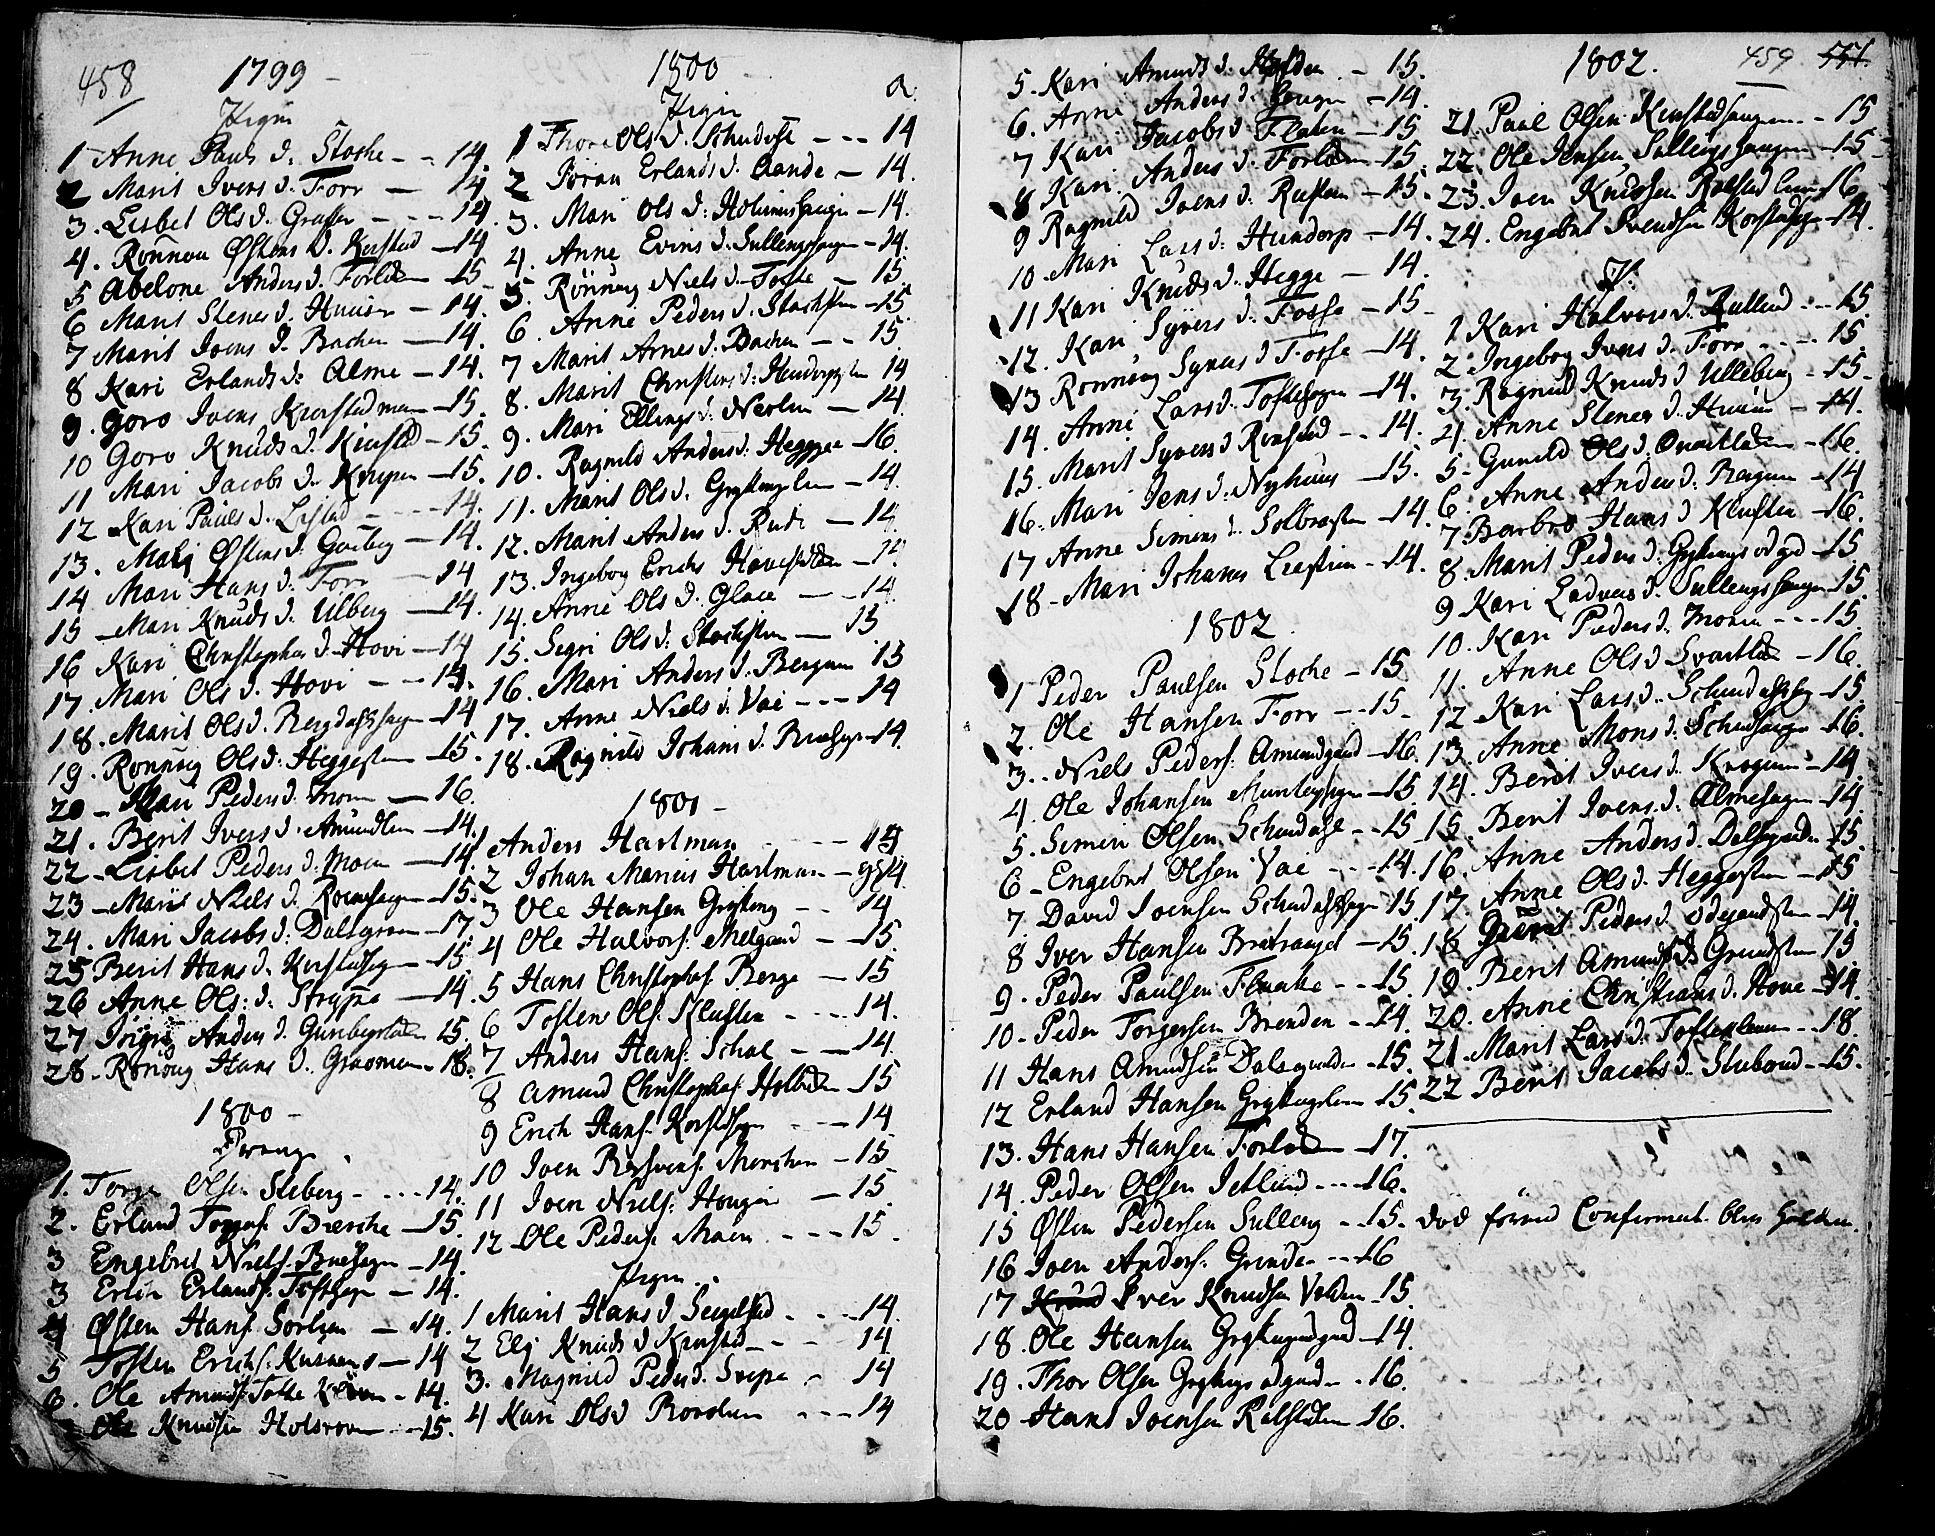 SAH, Fron prestekontor, H/Ha/Haa/L0001: Ministerialbok nr. 1, 1799-1816, s. 458-459